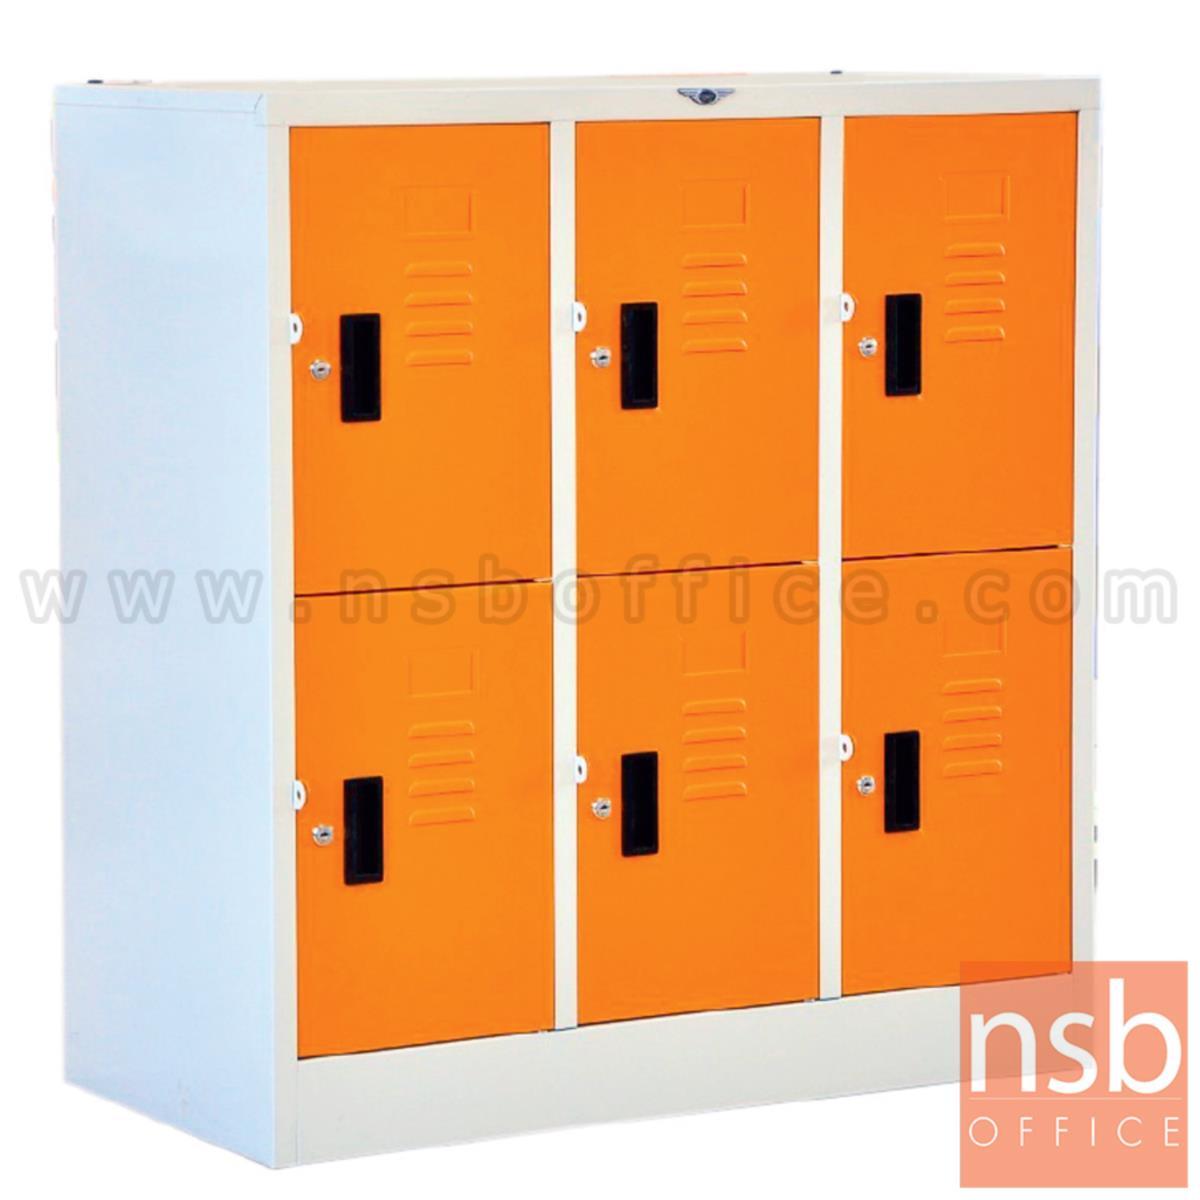 E08A035:ตู้ล็อกเกอร์เหล็กเตี้ย 6 ประตู  รุ่น Rosemond (โรสมอนด์)  ขนาด 91.2W*45.7D*97.7H cm.